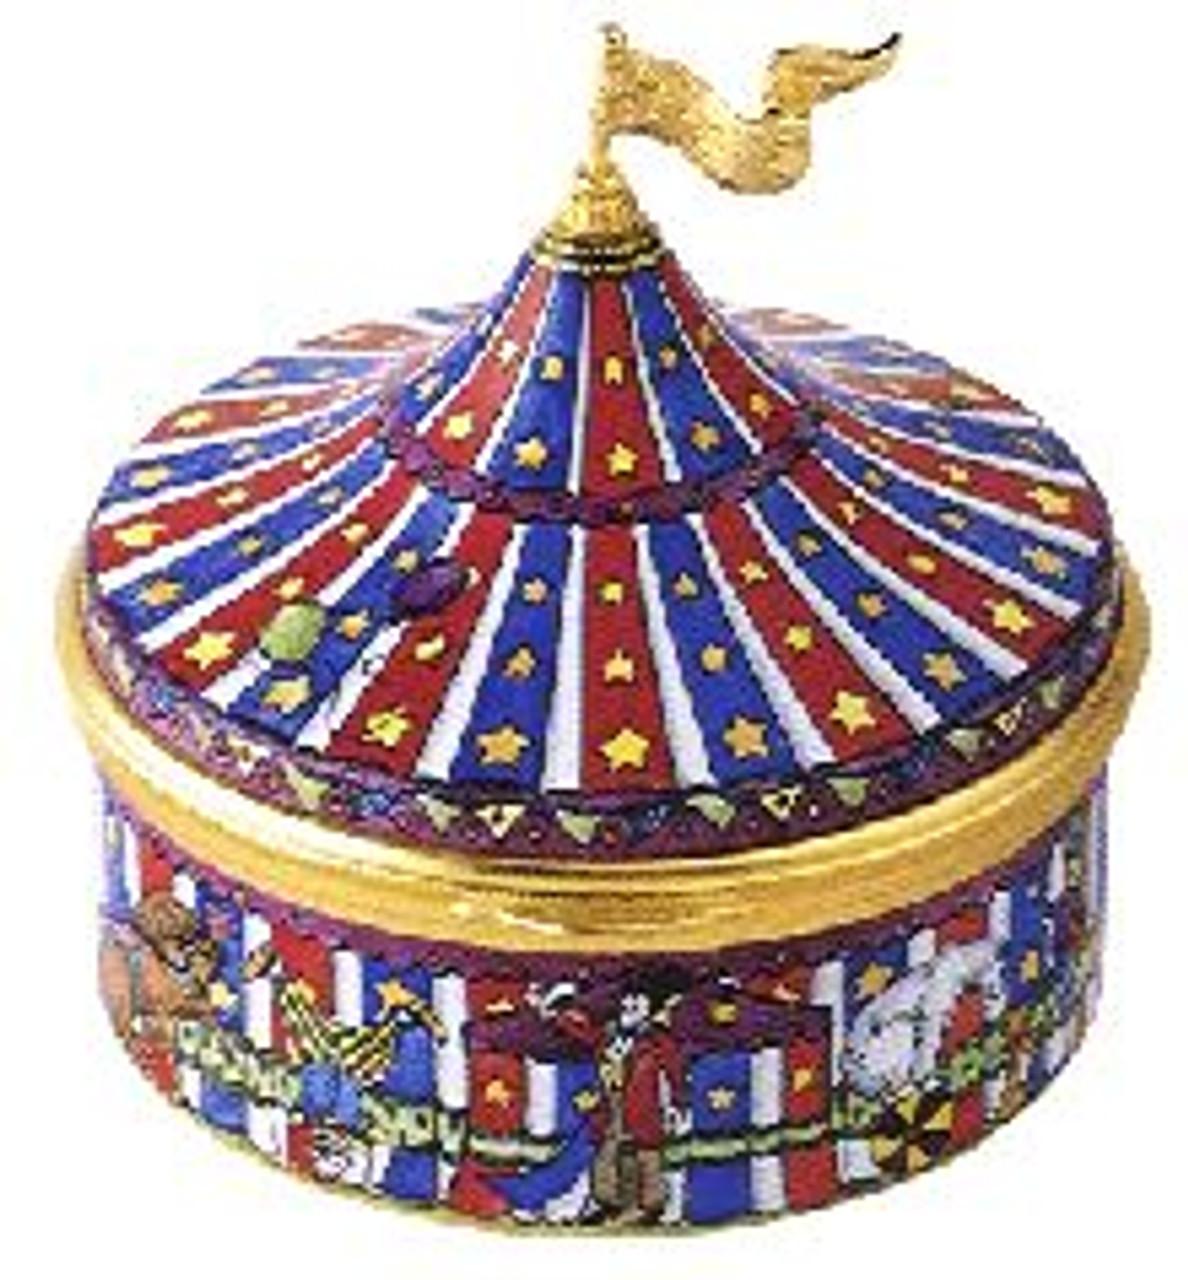 Staffordshire Circus Big Top